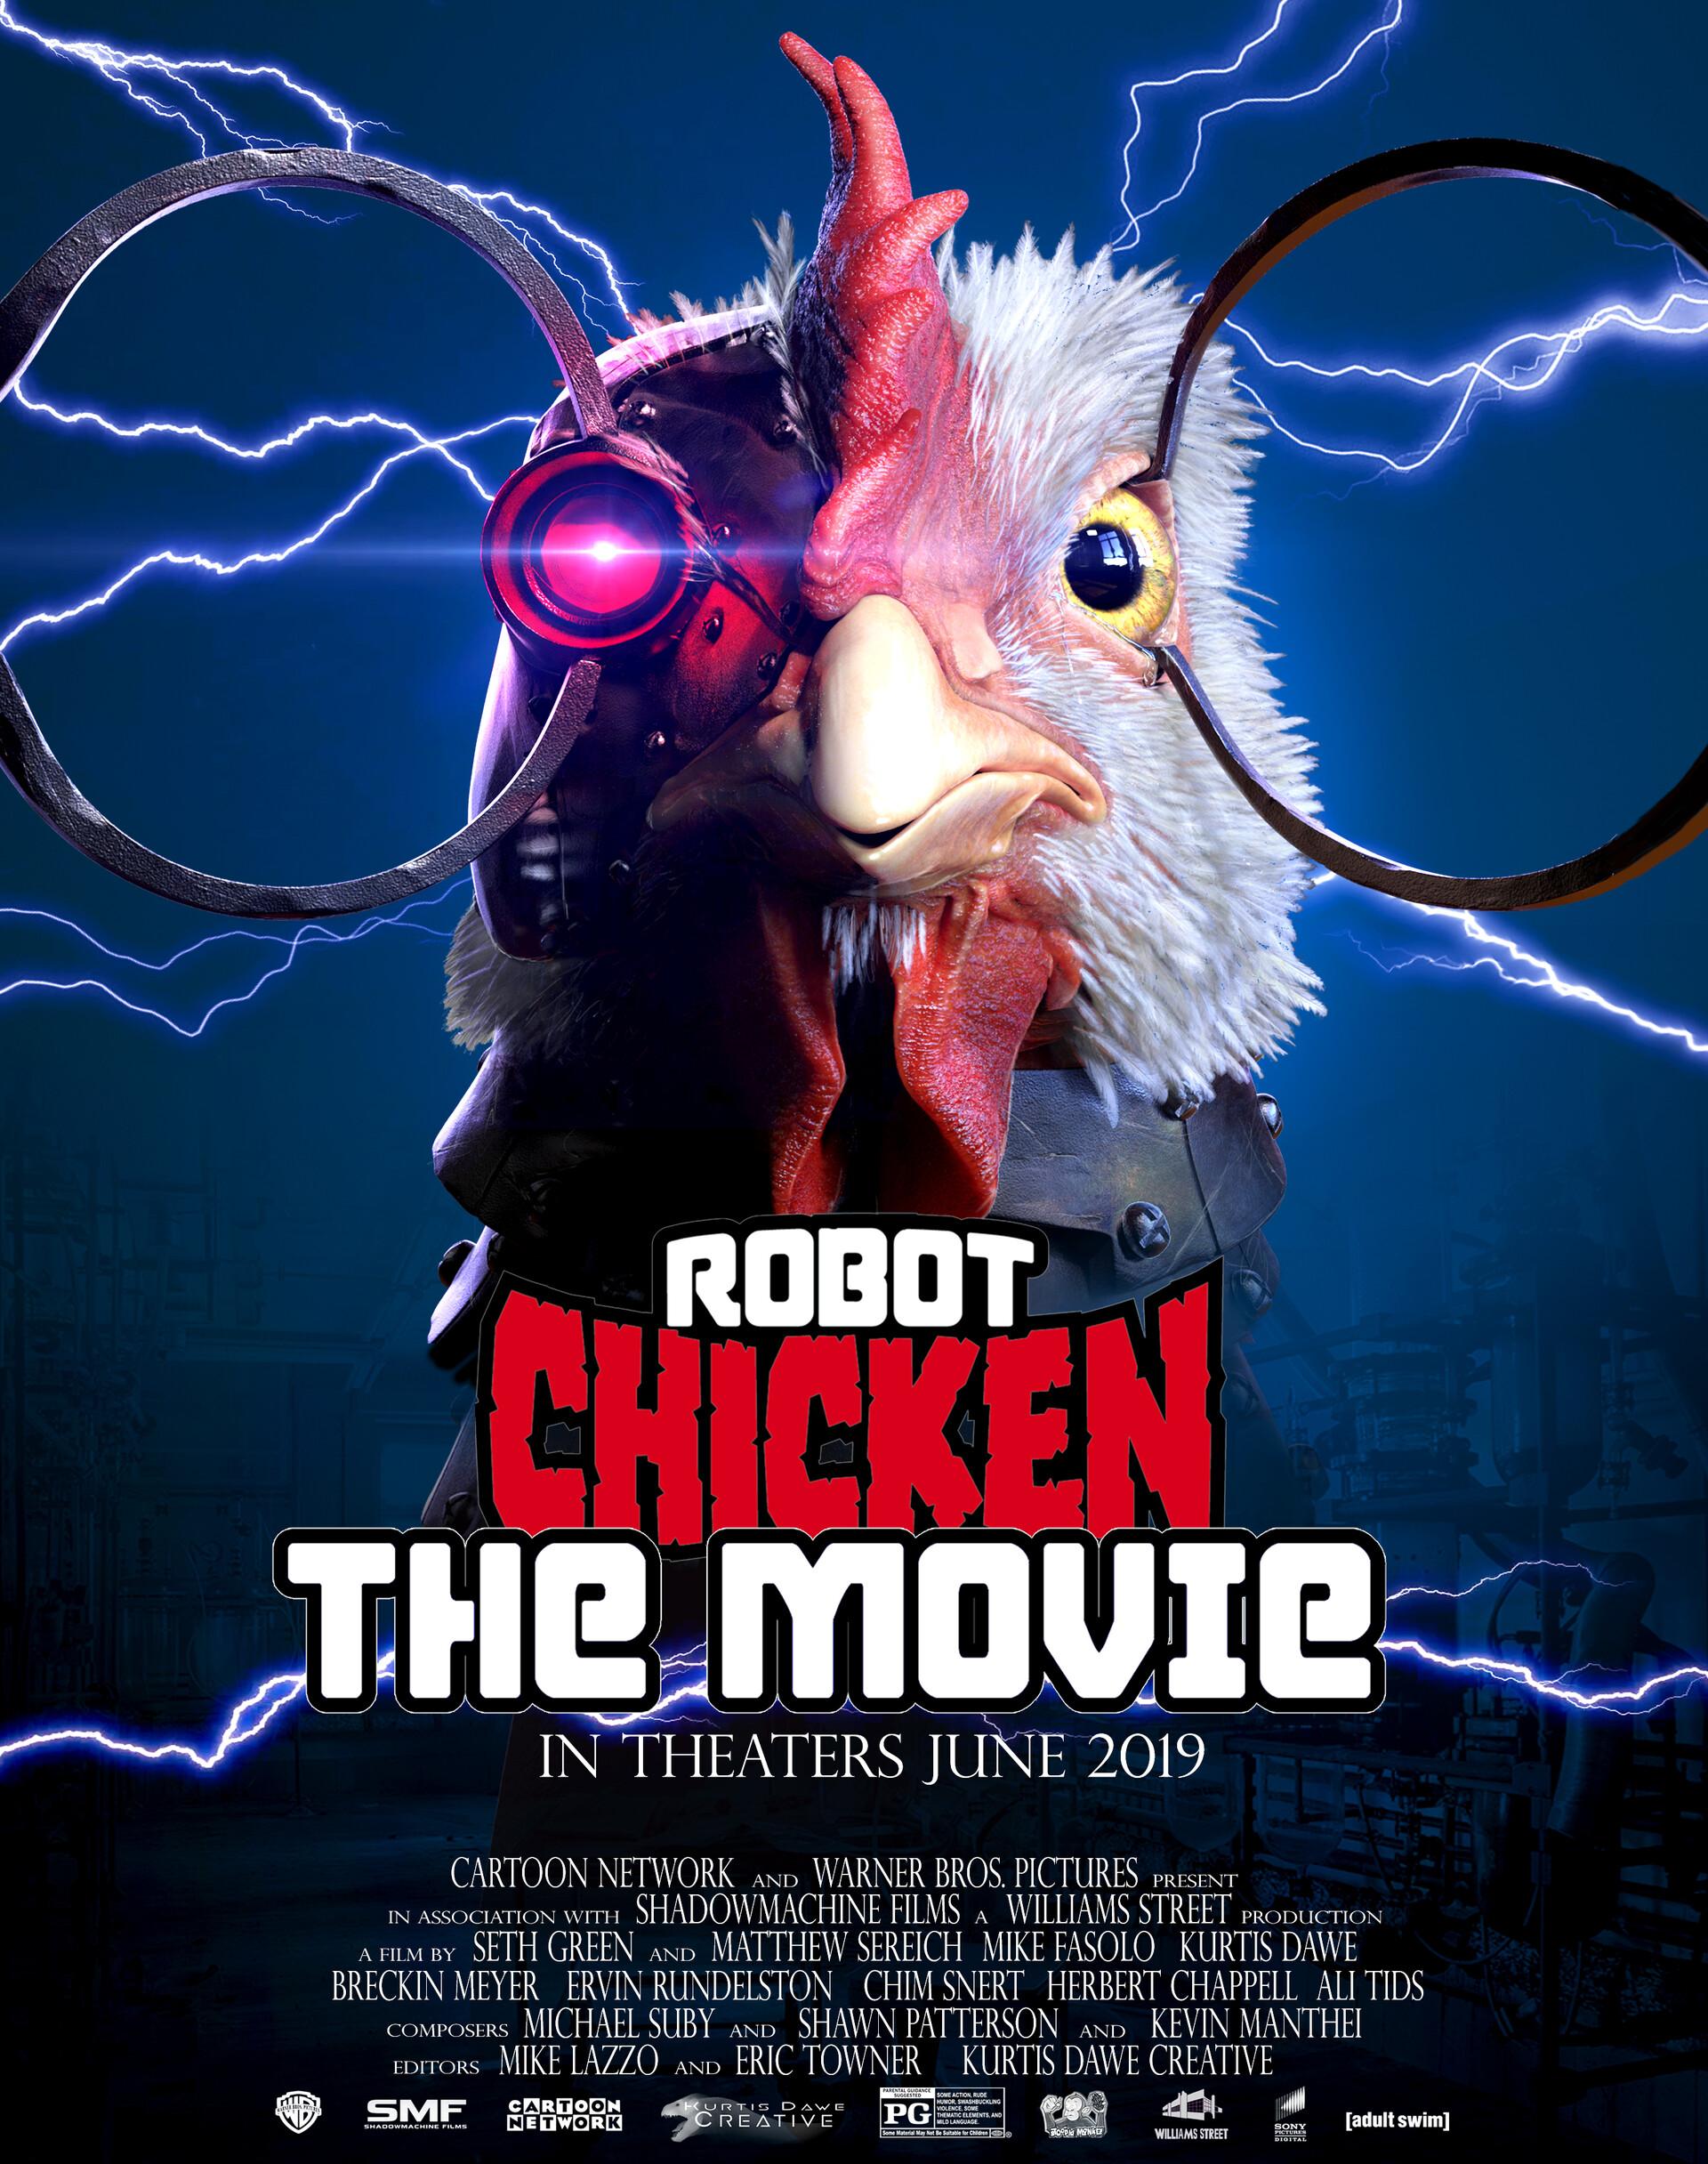 Kurtis Dawe - Robot Chicken Movie Character Model